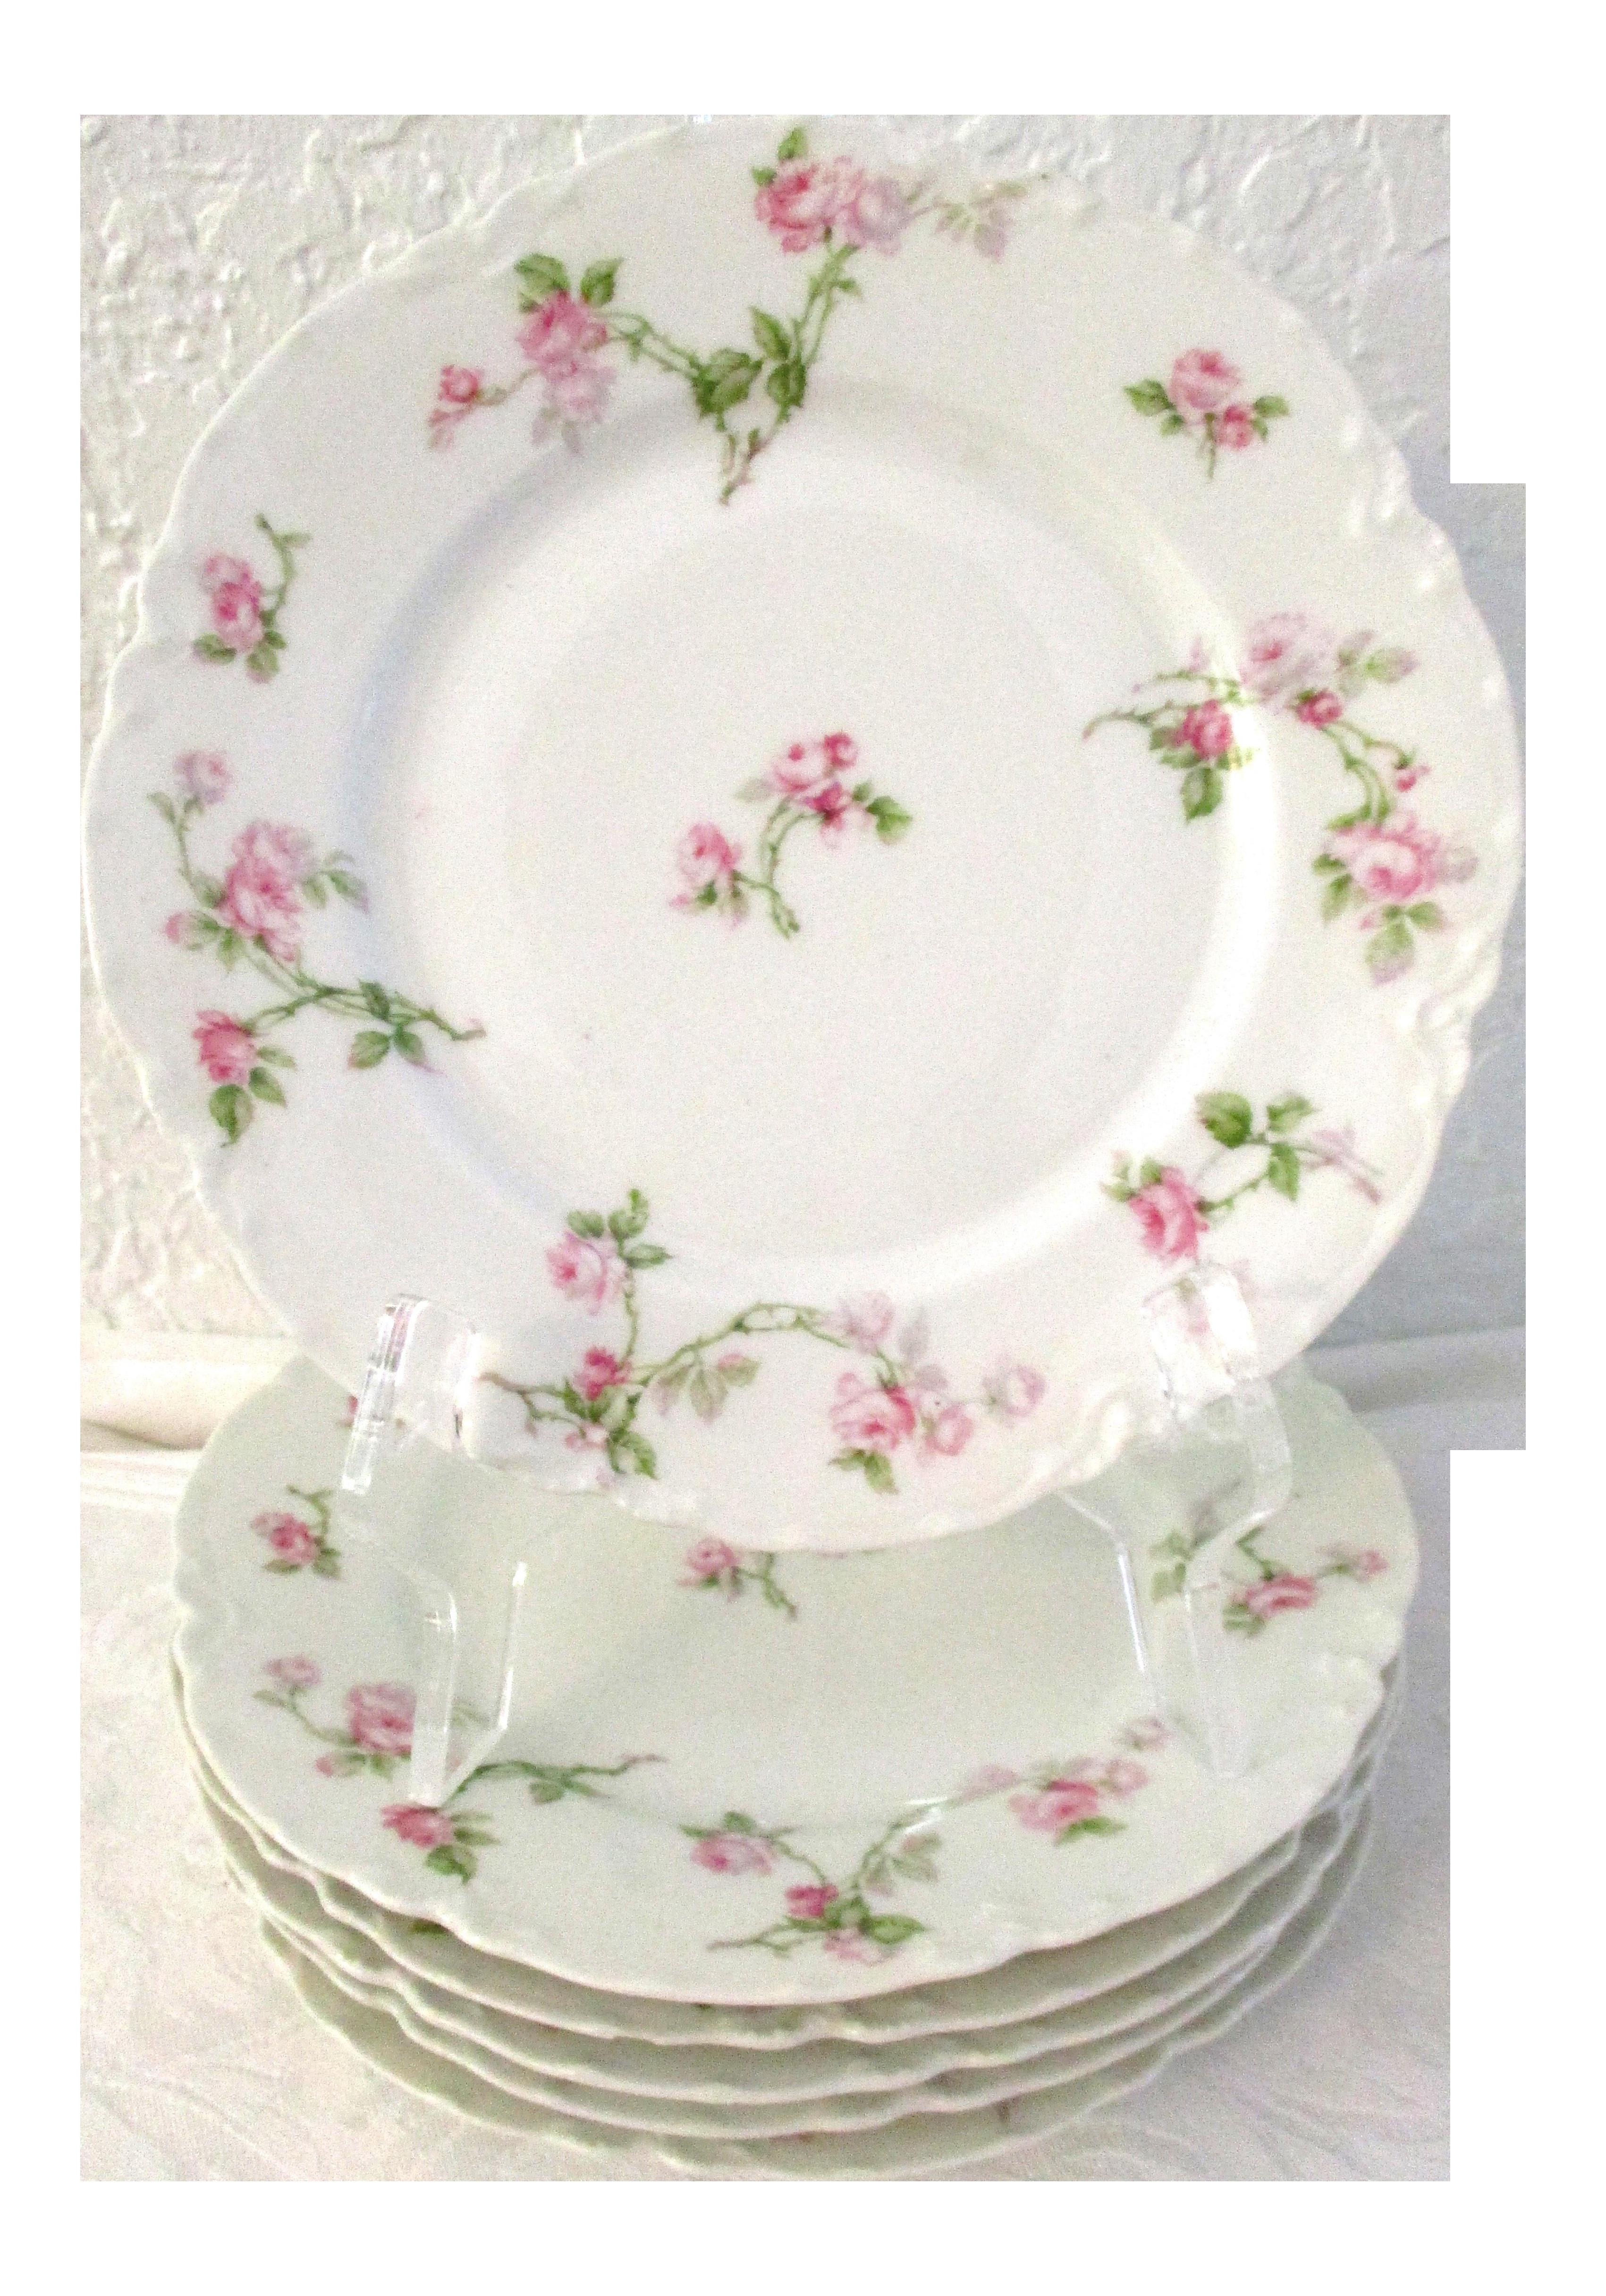 Haviland Limoges Rose Luncheon Plates Set of 6  sc 1 st  Chairish & Haviland Limoges Rose Luncheon Plates Set of 6 | Chairish